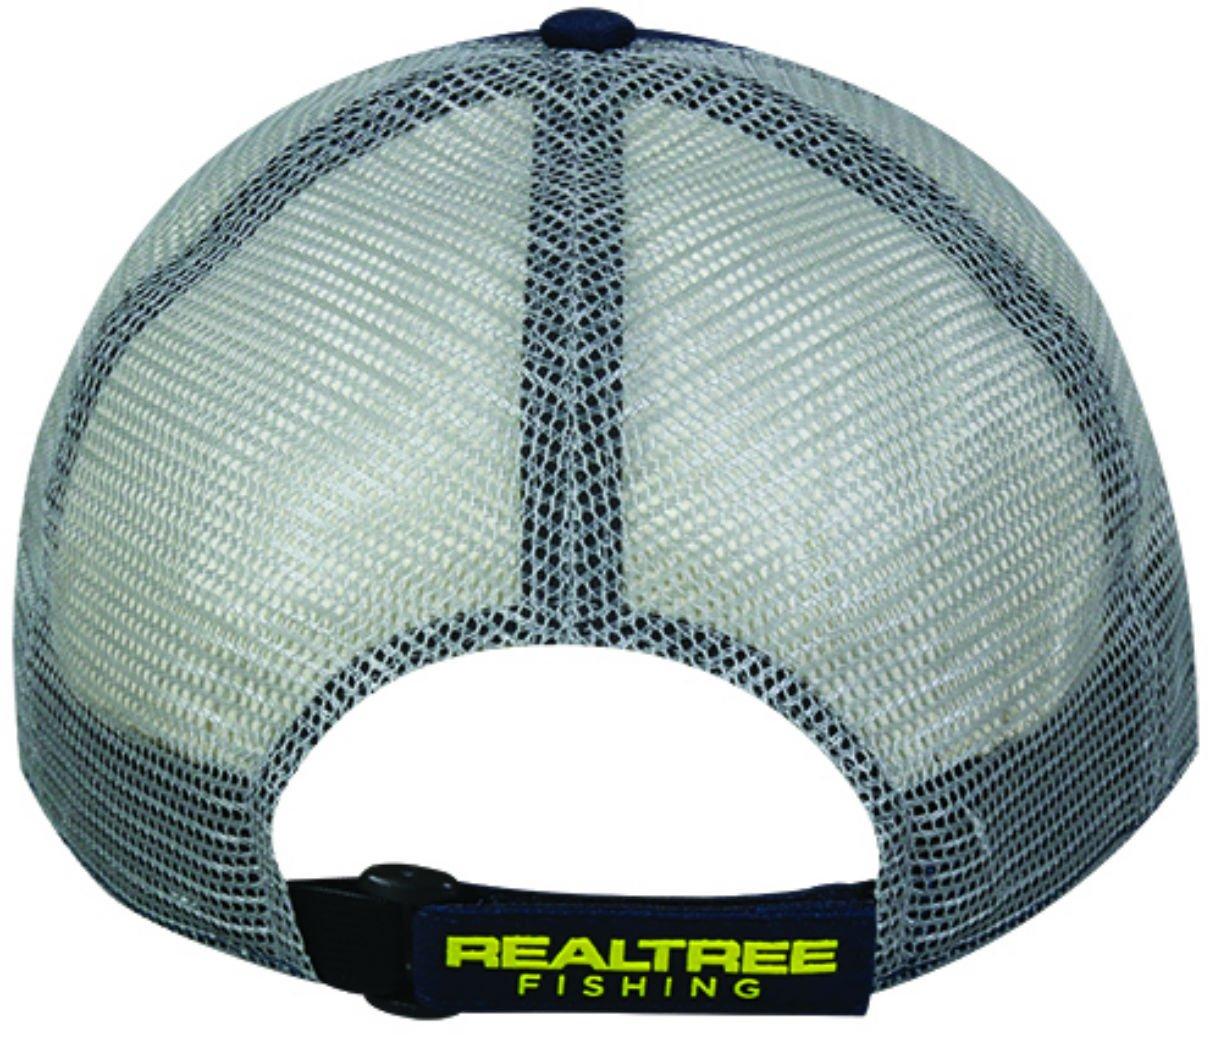 b1c6c889 Amazon.com: Outdoor Cap Men's Realtree Fishing Logo Cap, Navy/Gray, One  Size: Sports & Outdoors